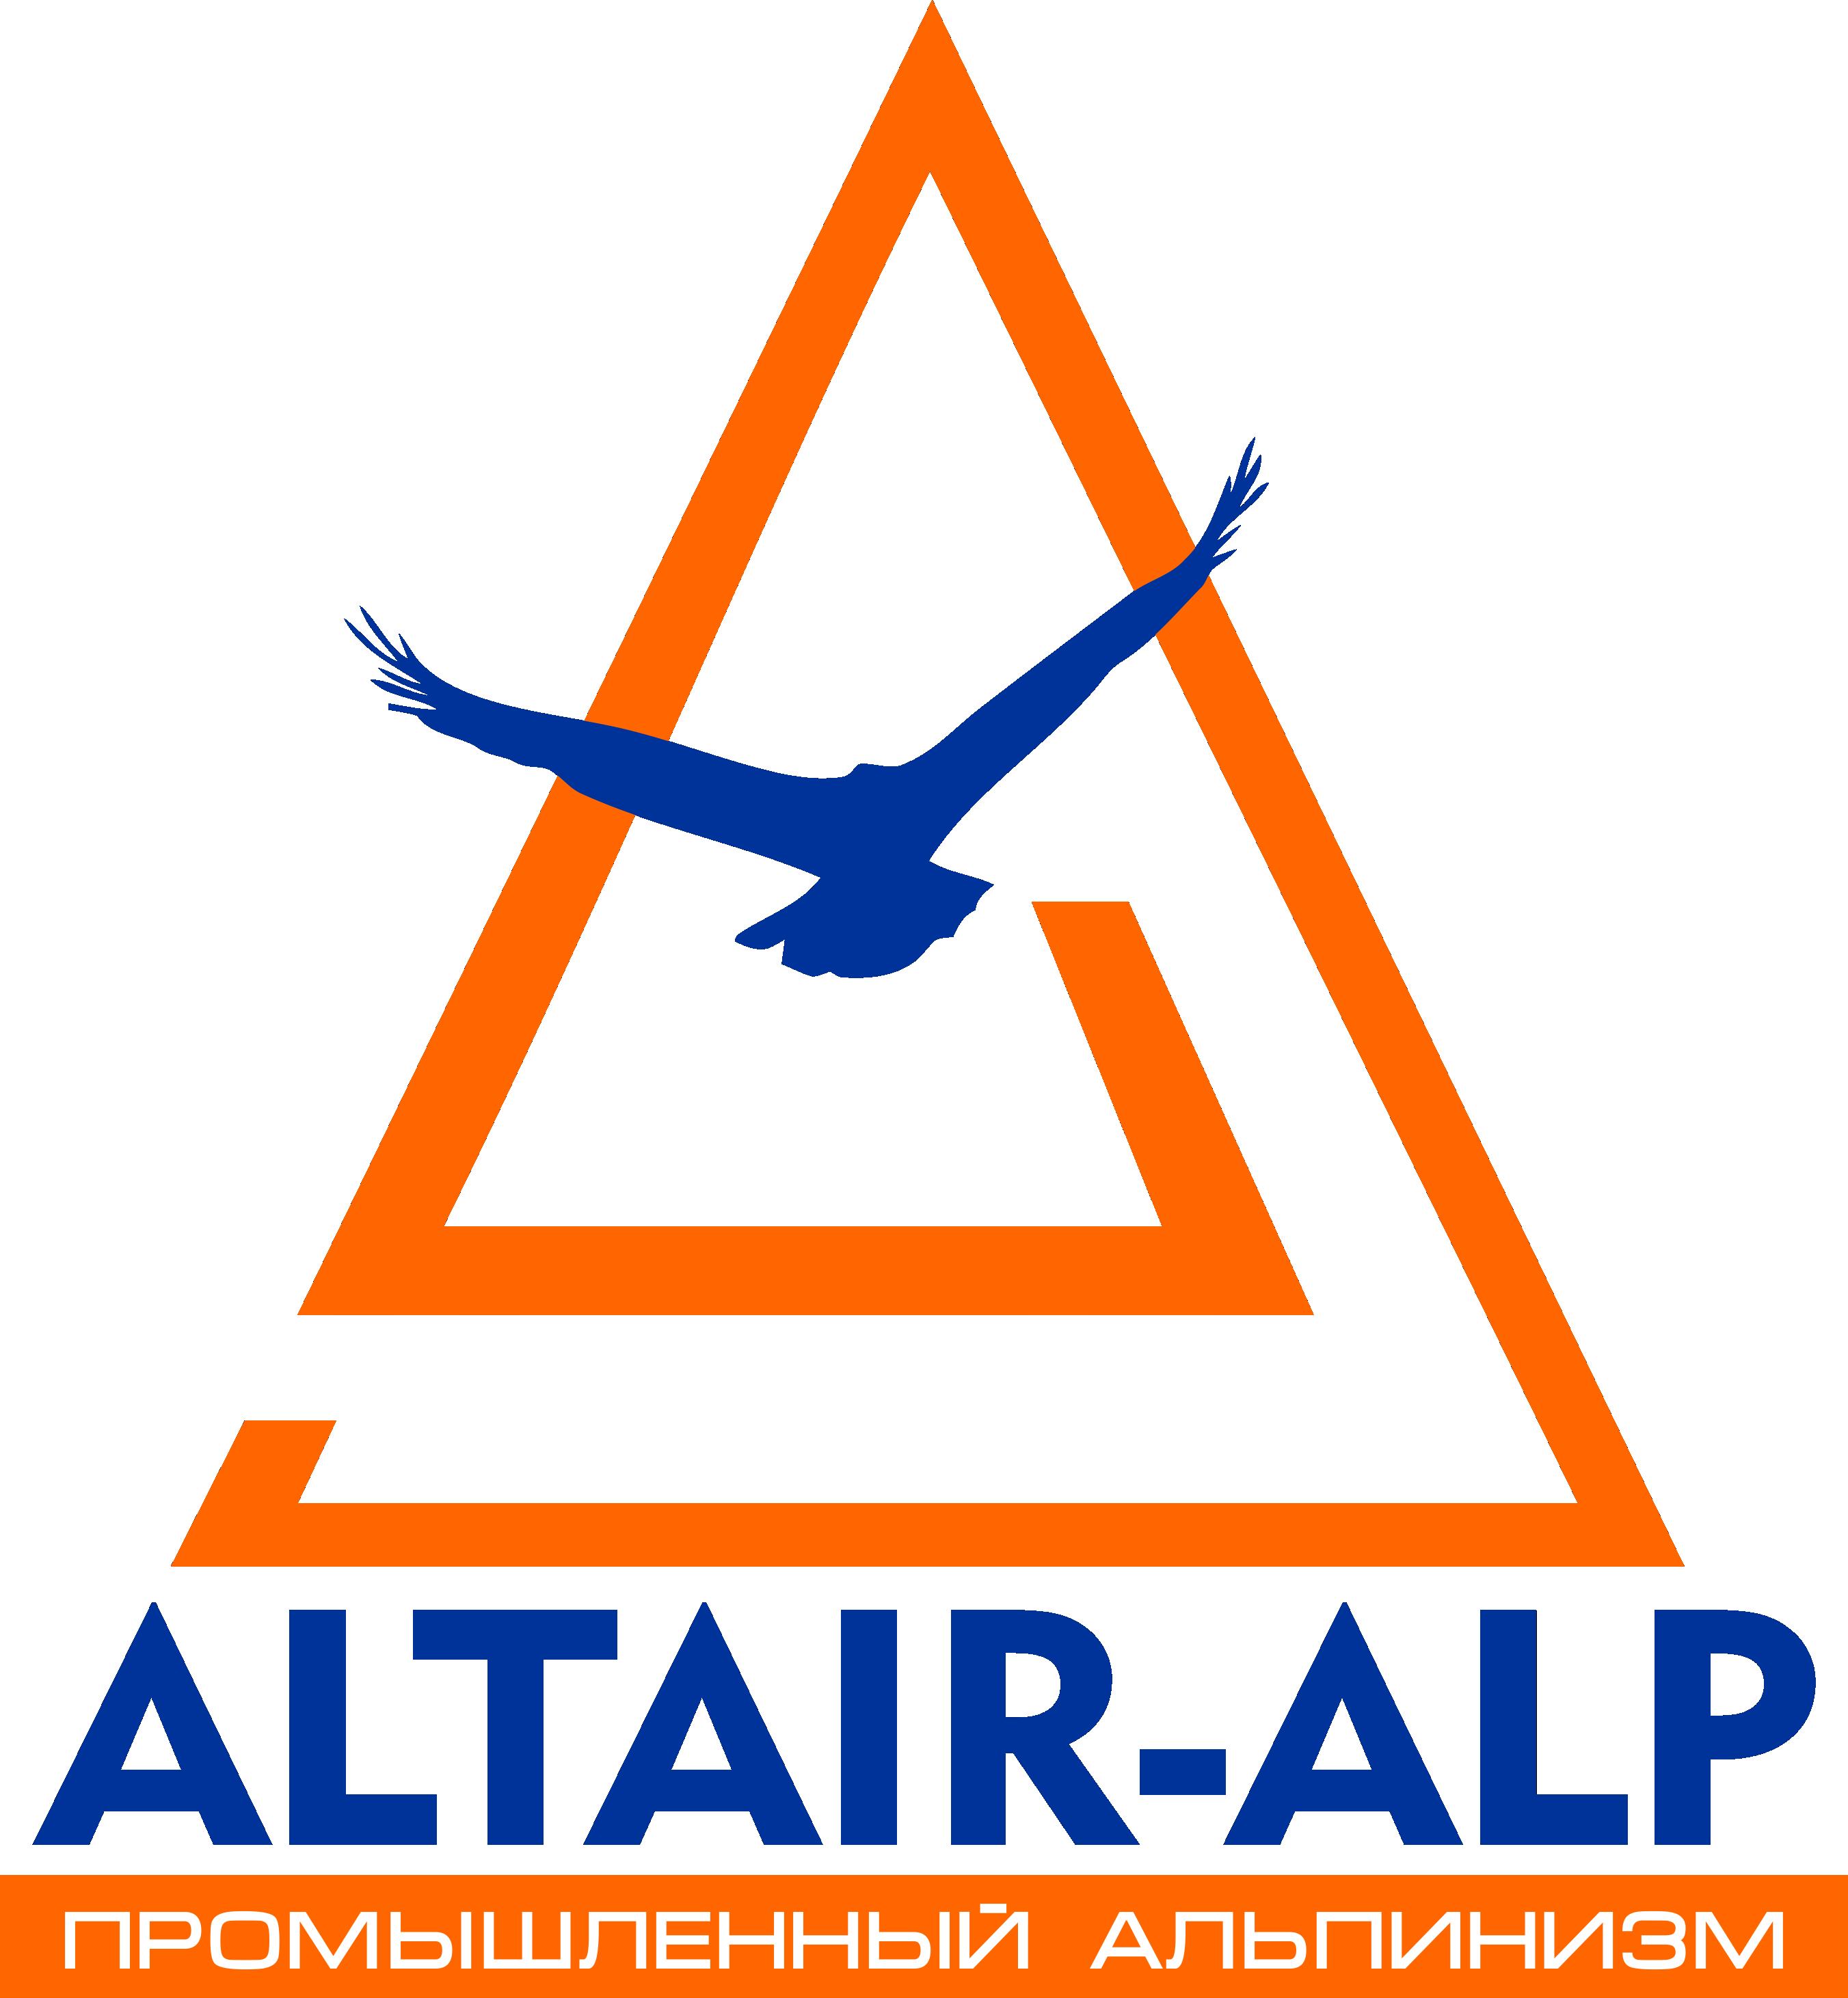 Альтаир Альп